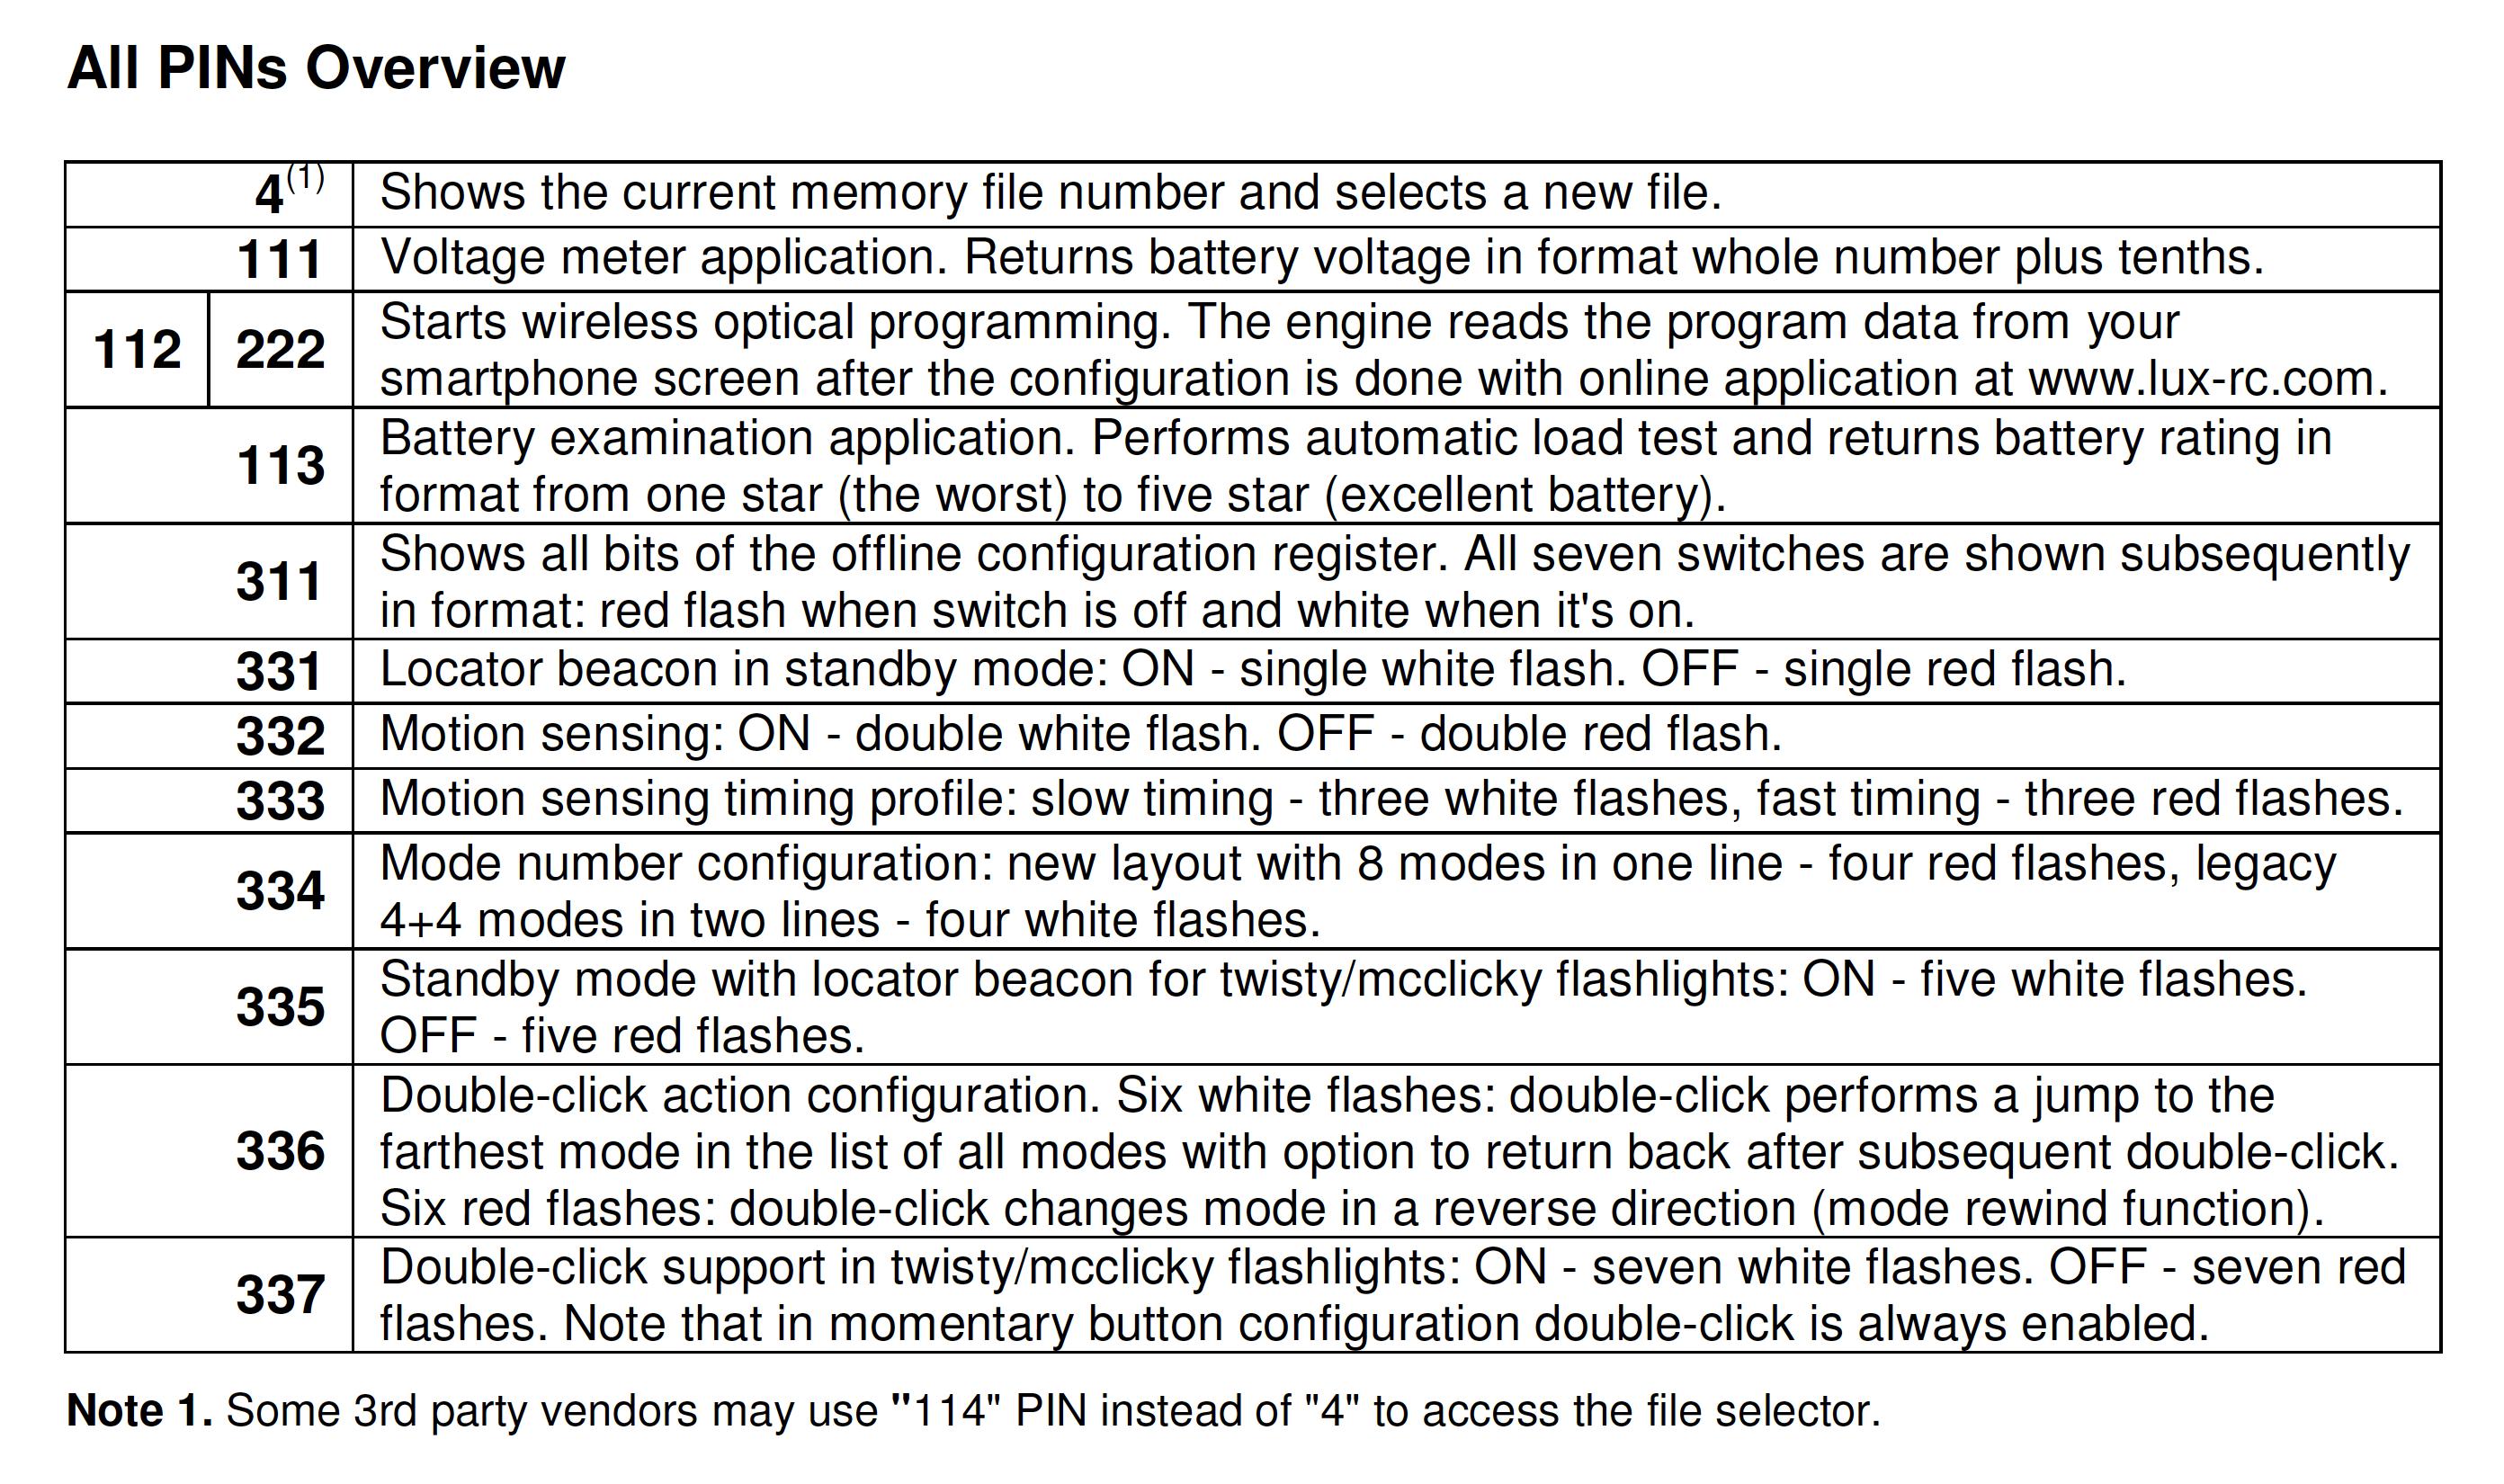 lux-rc 371 v2.0 manual pins list